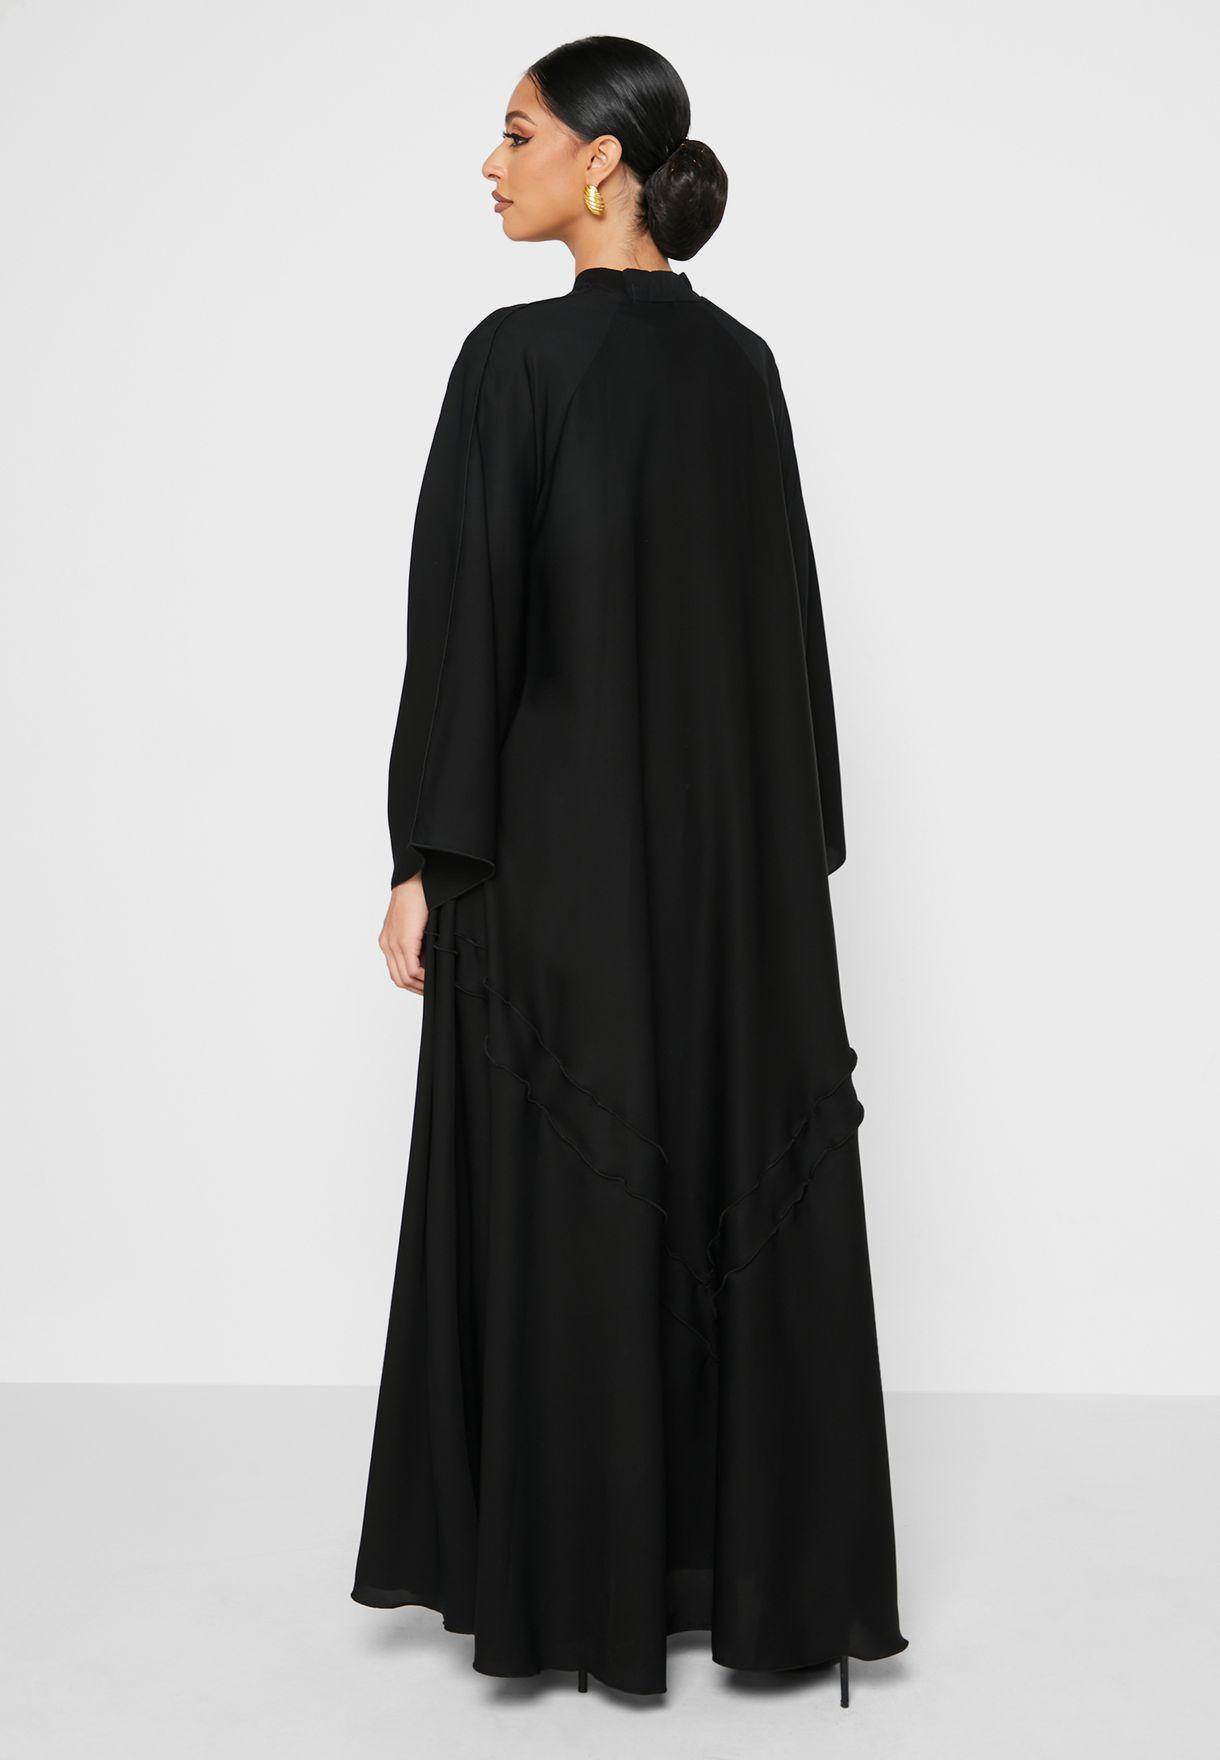 Waist tie Abaya